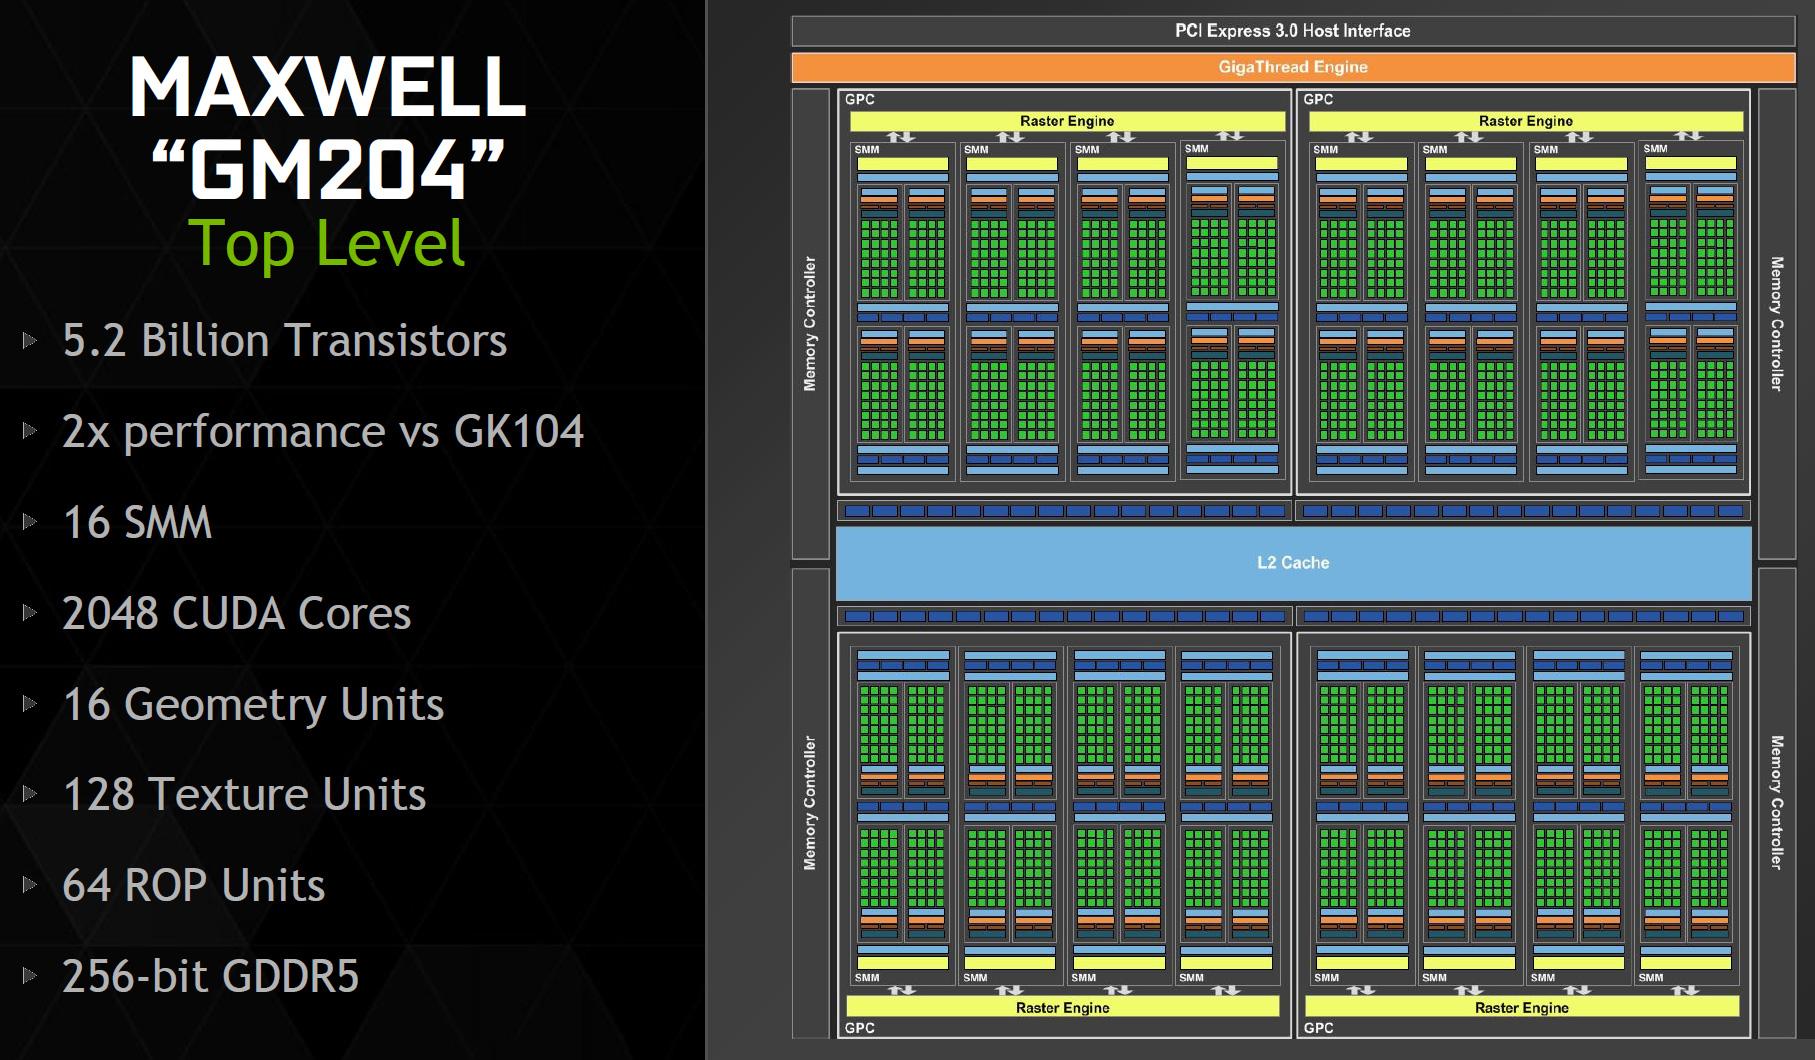 maxwell-gm-204-top-level-diagram